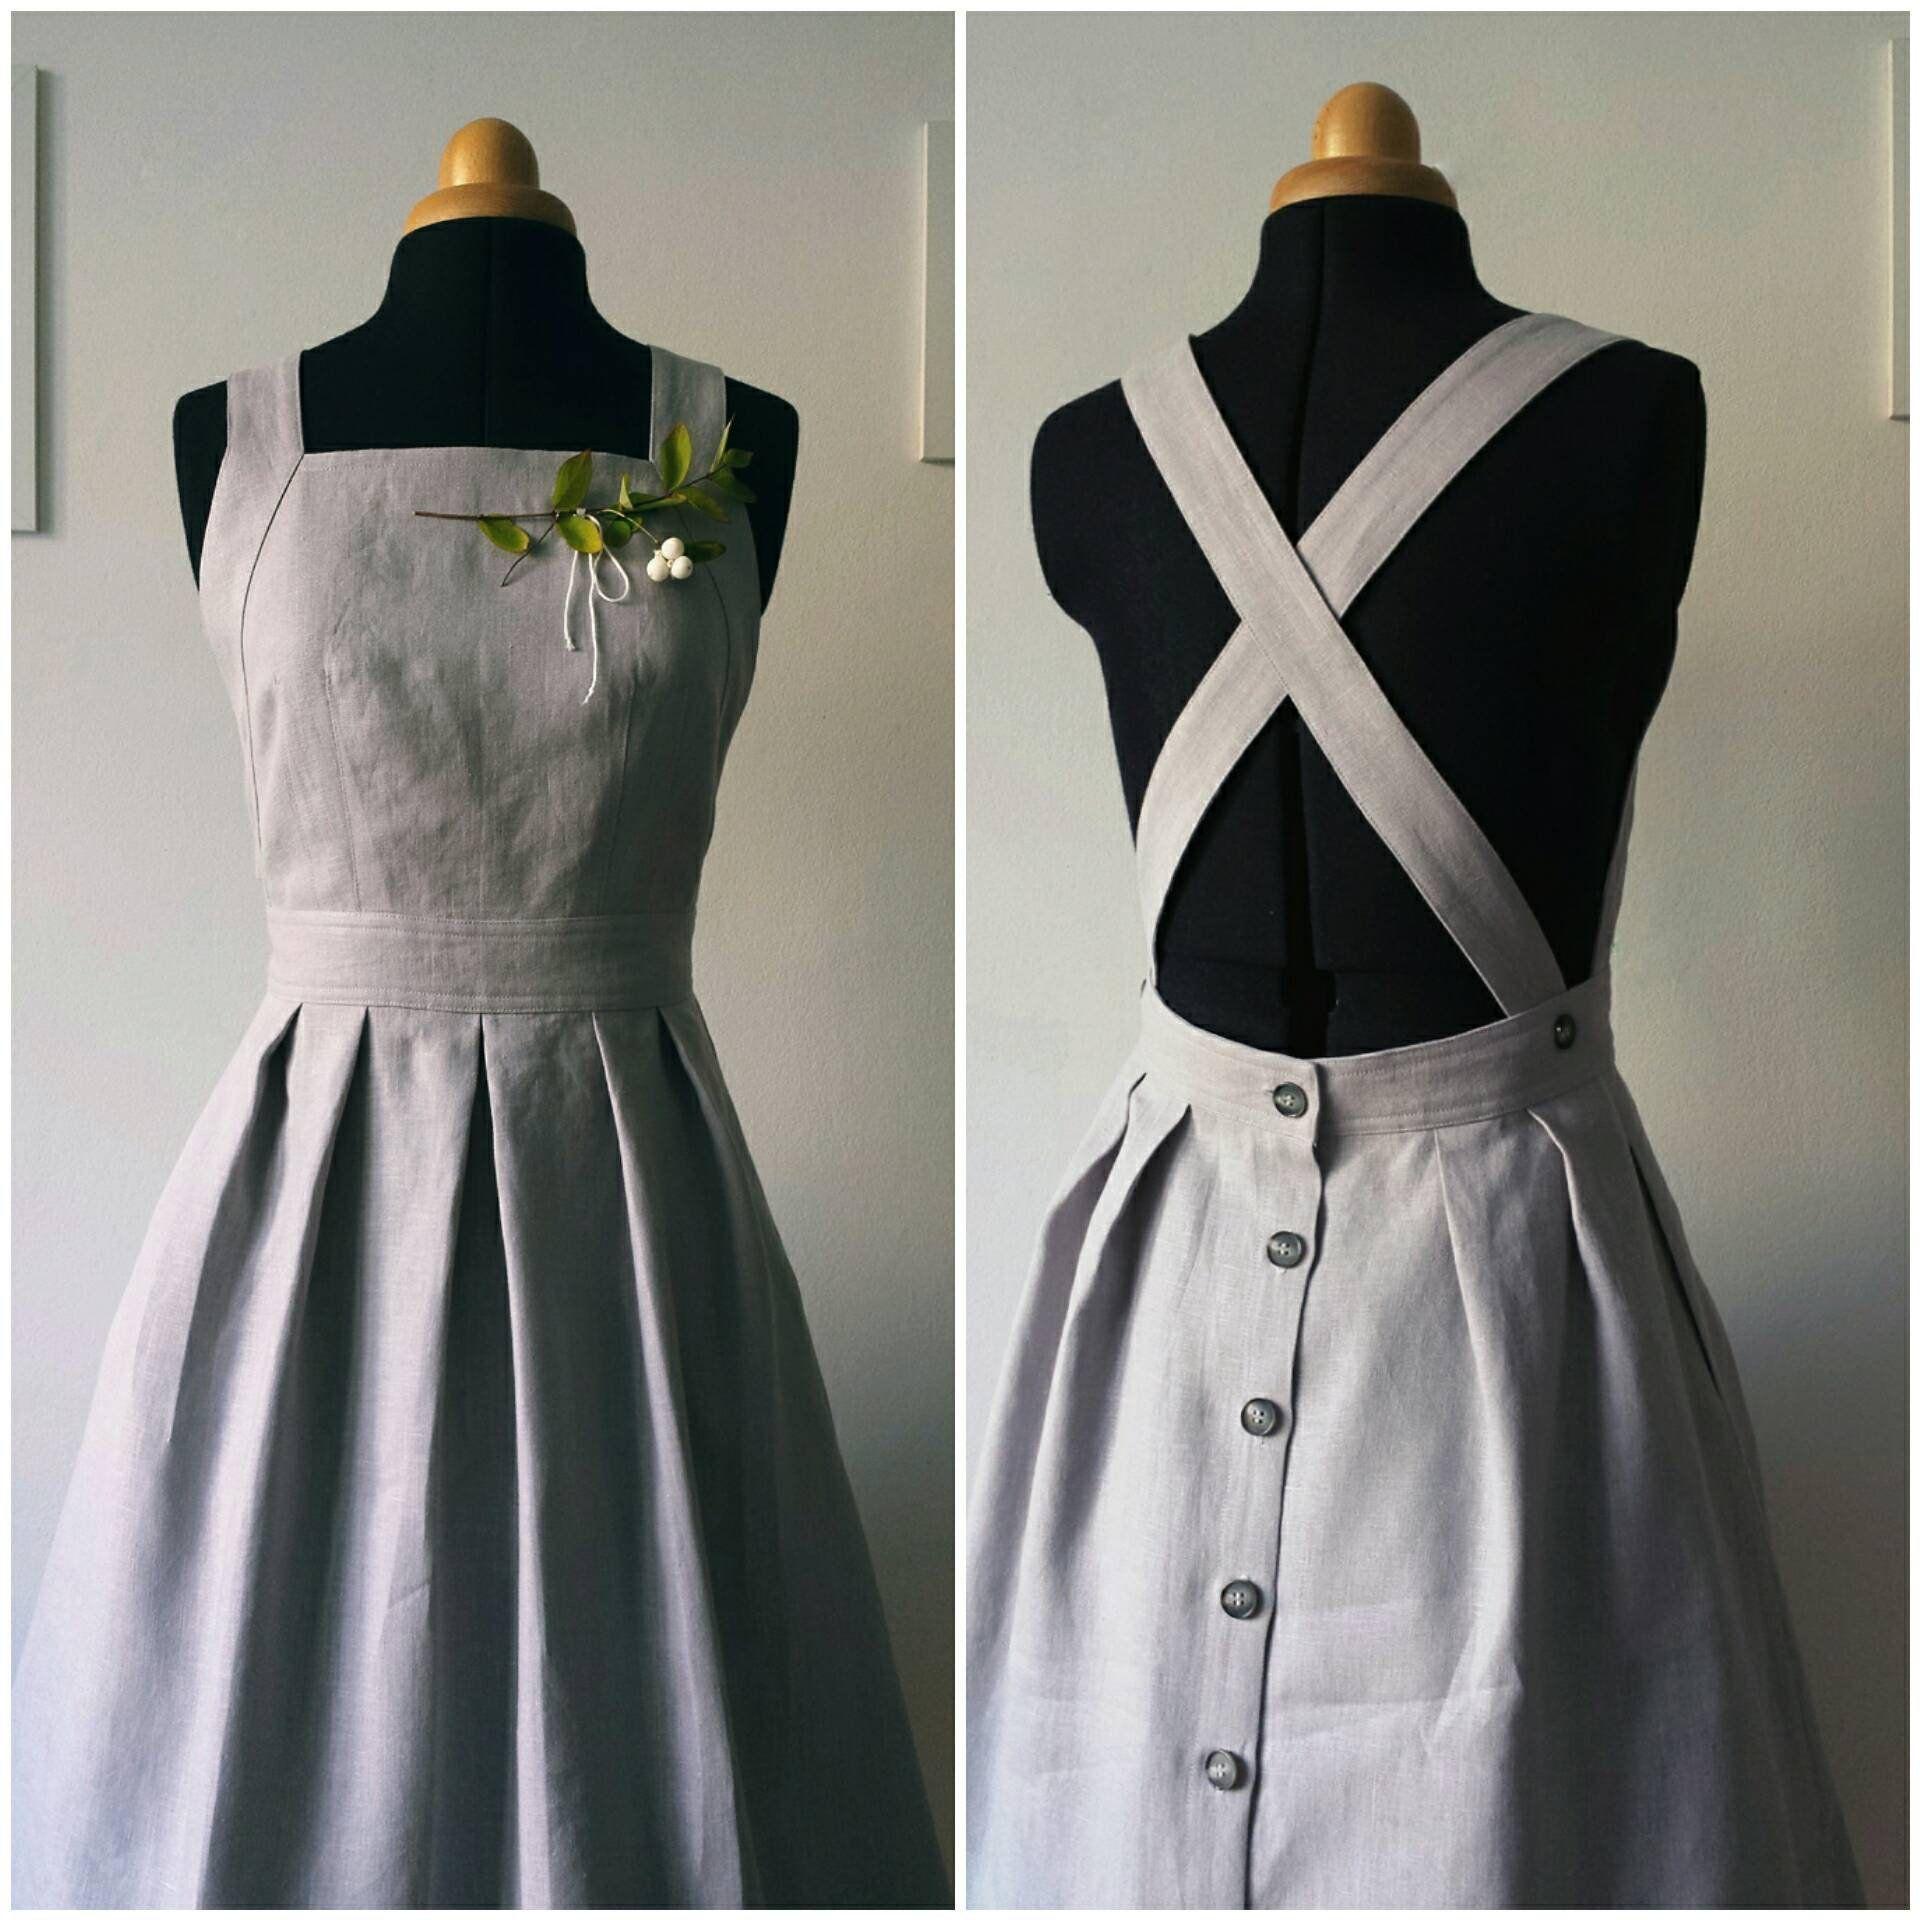 Ladies Womens Short Mini Tartan Brace Pinafore Dungaree Skater Skirt Dress 4-20